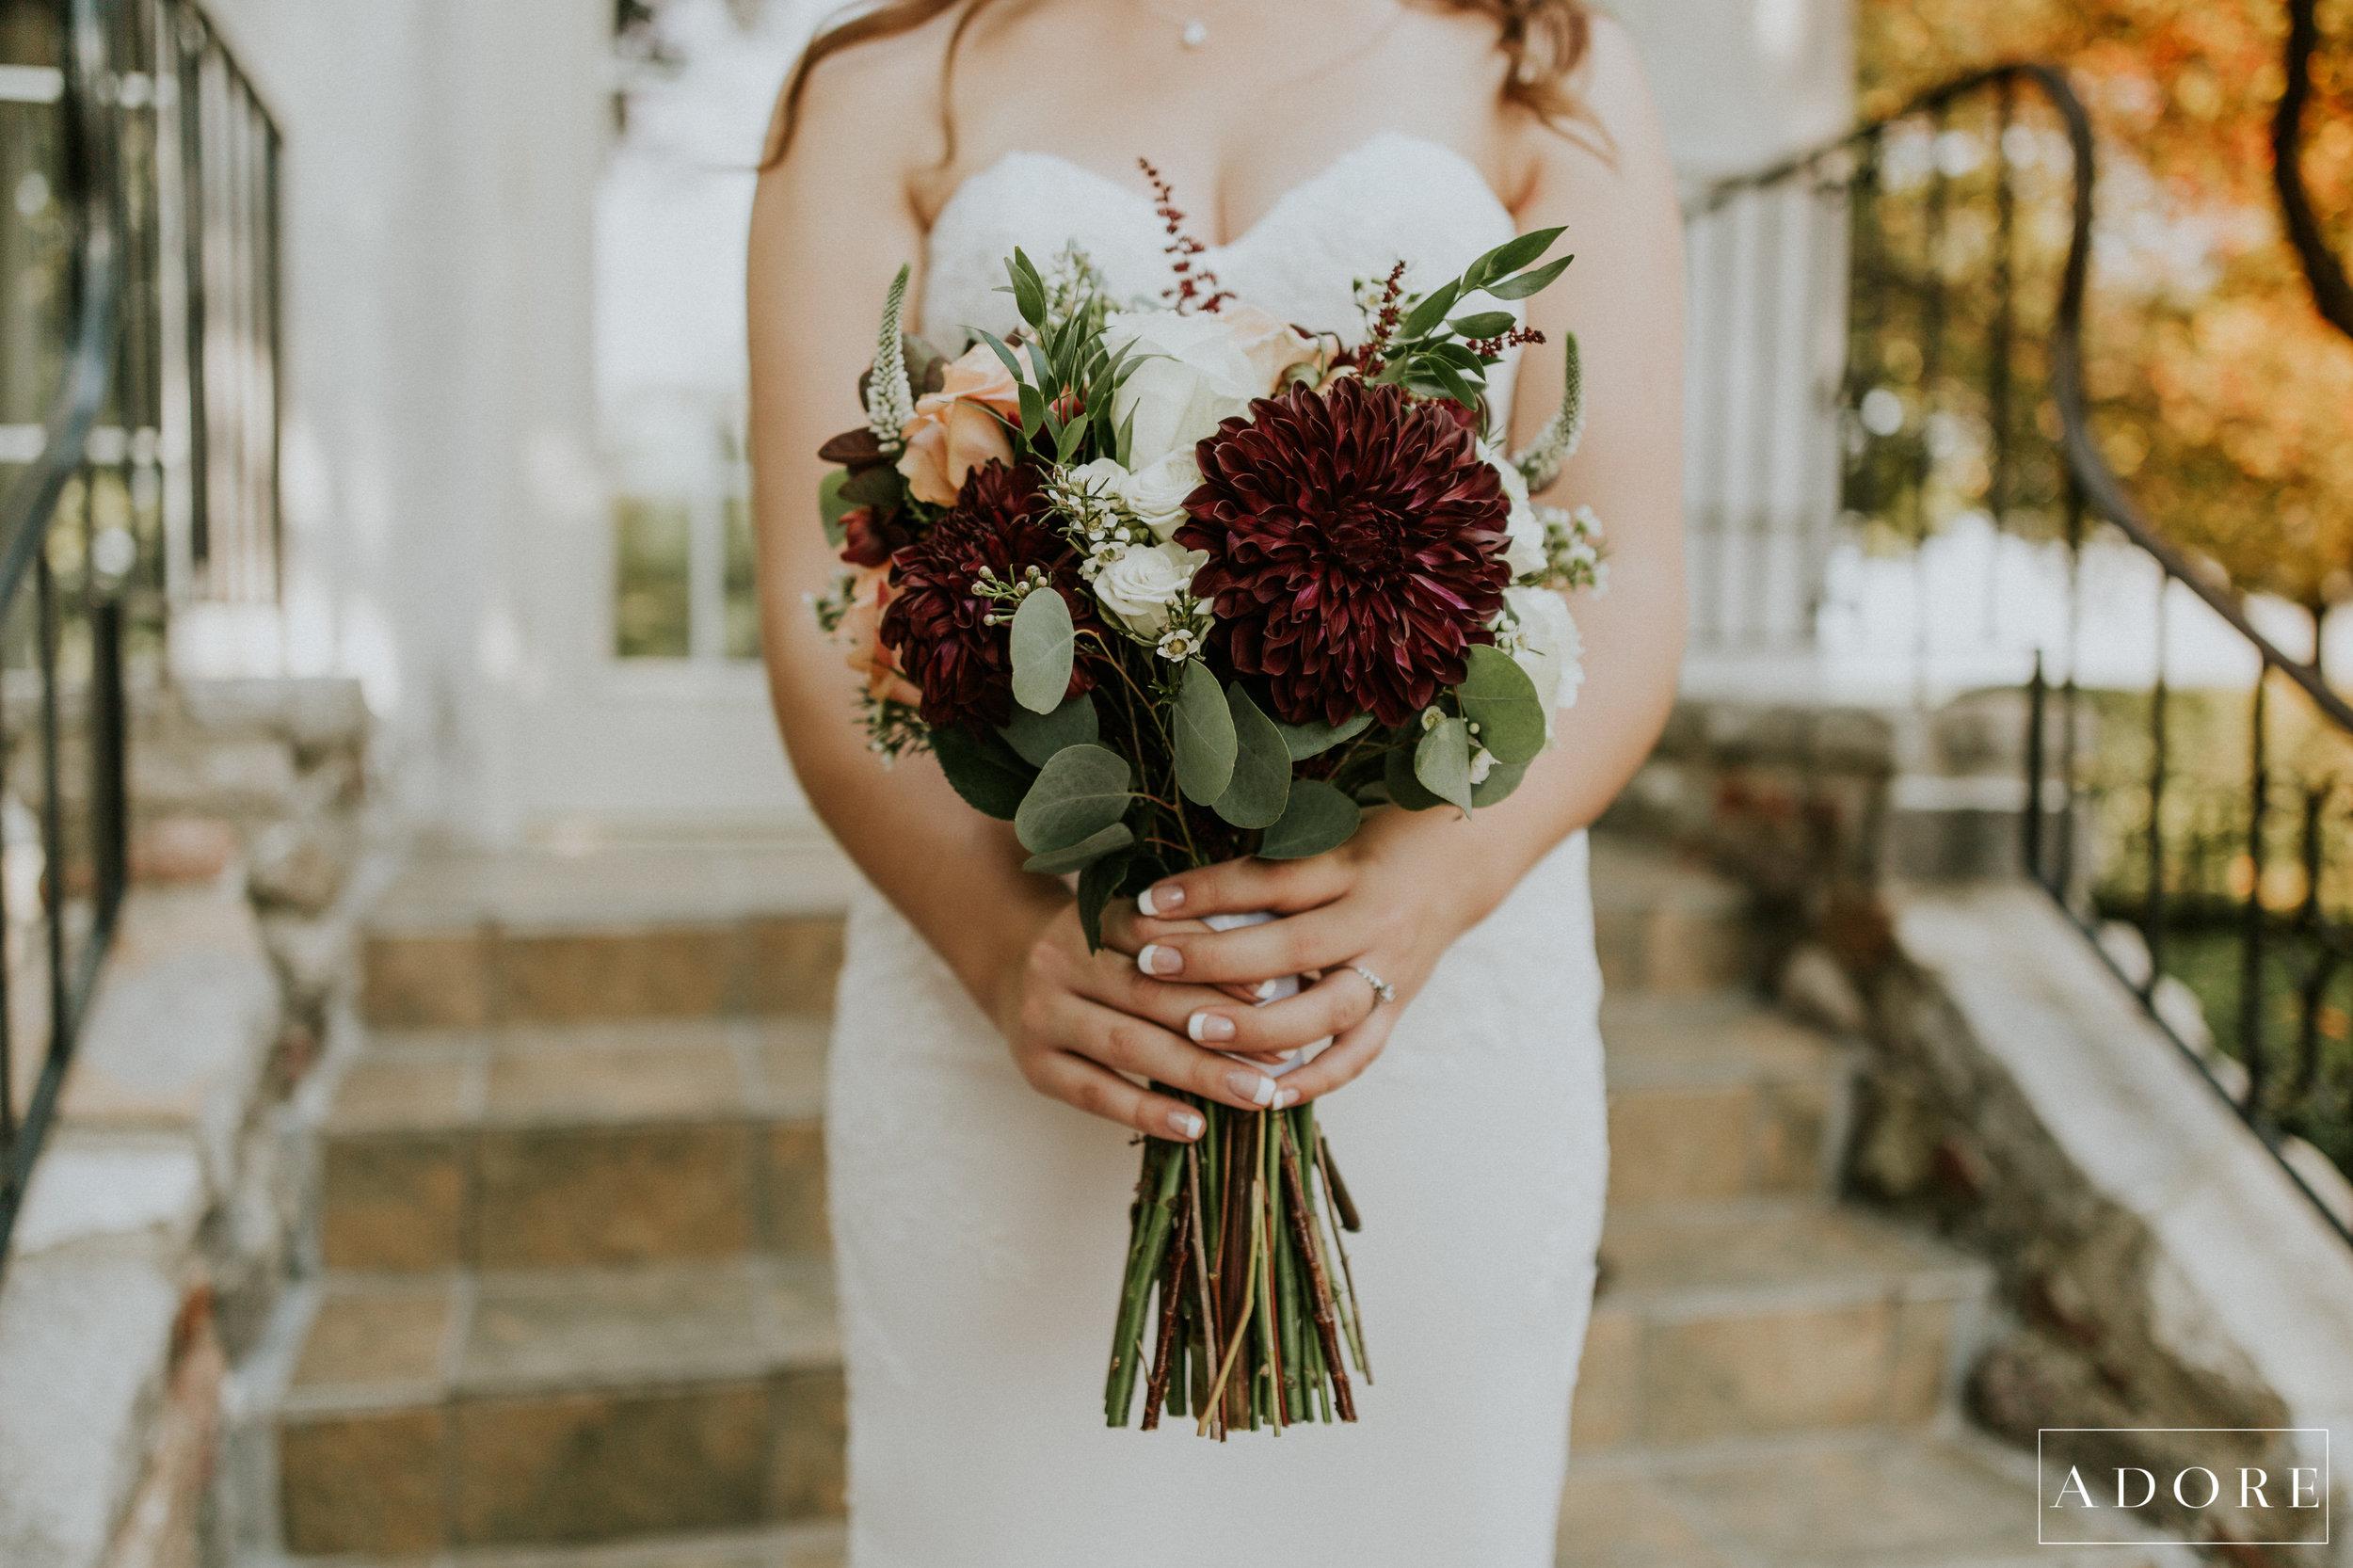 Adore Wedding Photography-24910.jpg